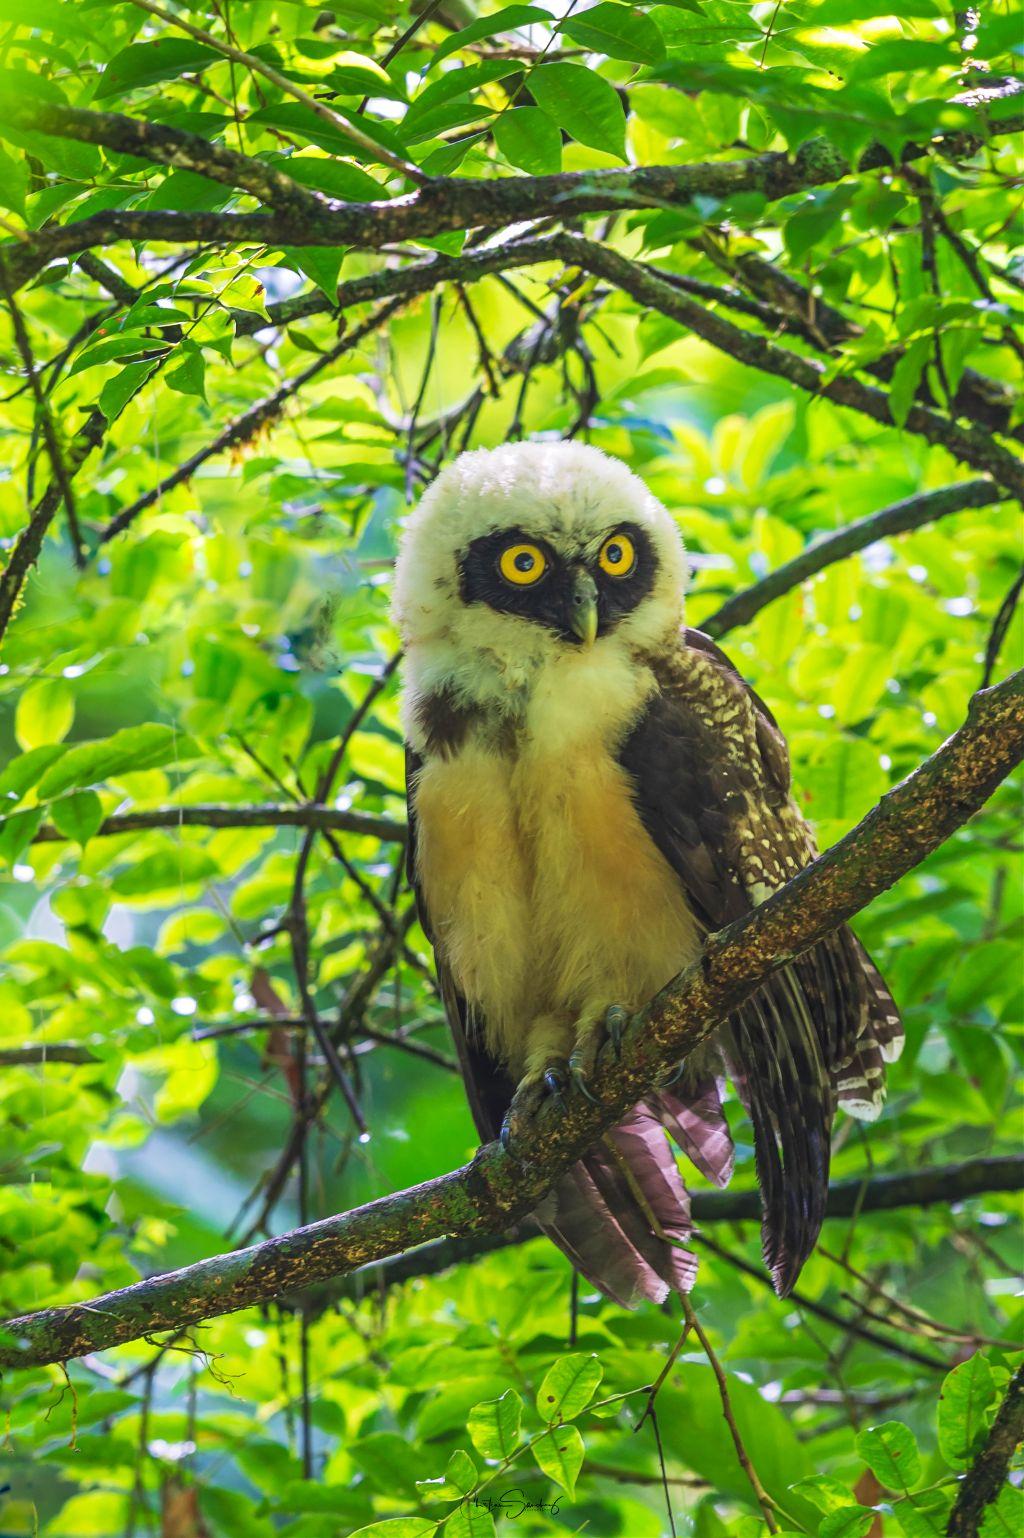 Spectacled Owl Oropopo, buho de anteojos (Pulsatrix perspicillata)         #owl#duck #nature #bird #puffin #toucan #costarica # #owl #bird #honeycreeper #bird #tanager #tanager #bird #nature #wild #costarica #toucan #nature #costarica #bird # #owl #bird #wild #bird #nature # #hawk #bird # #owl #nature #wild #wildlife # #bird #nature #wildlife #anime #animals #animals #travel #nature #birdsphotography #birdsphotography #interesting #colorful #colors #naturelovers #naturephotograpy #nature #wildflowerfaerie #wild #costarica #wild #wild #nature #photography Share  Copy URL